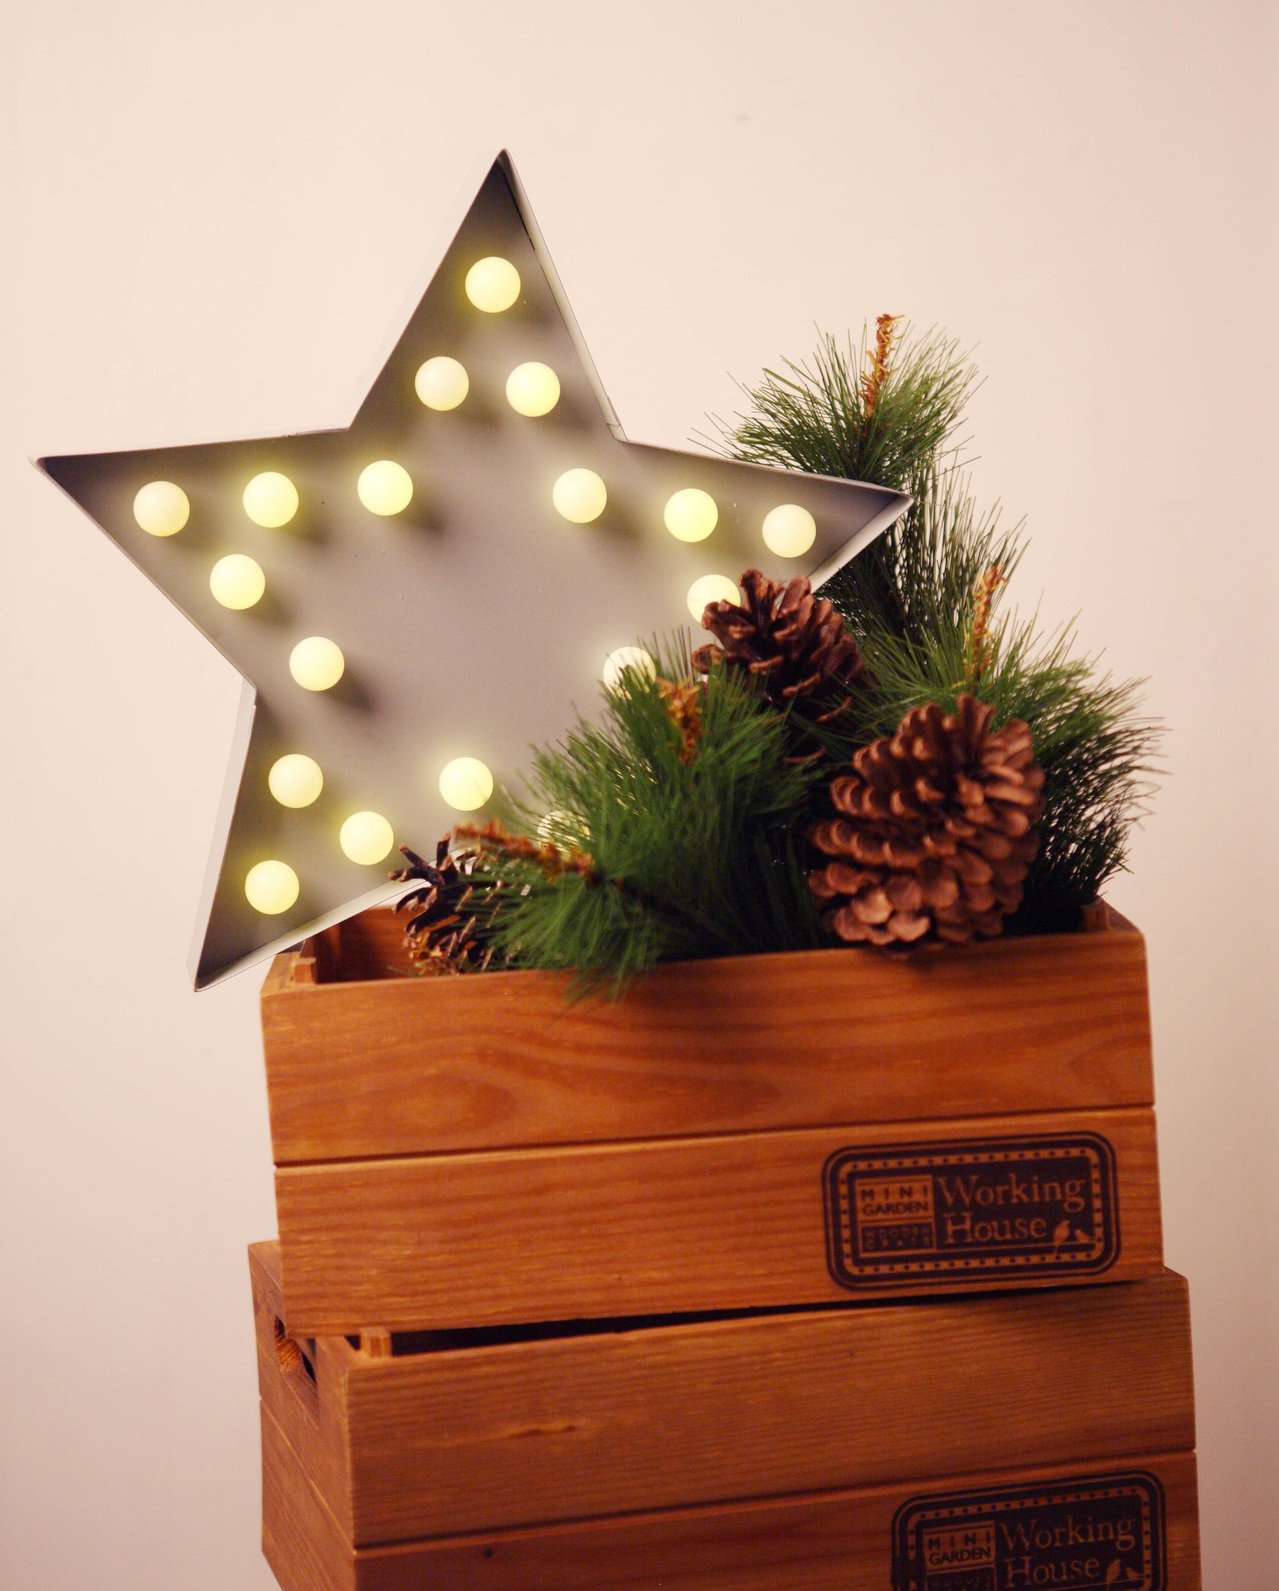 STAR擺飾燈。圖/生活工場提供